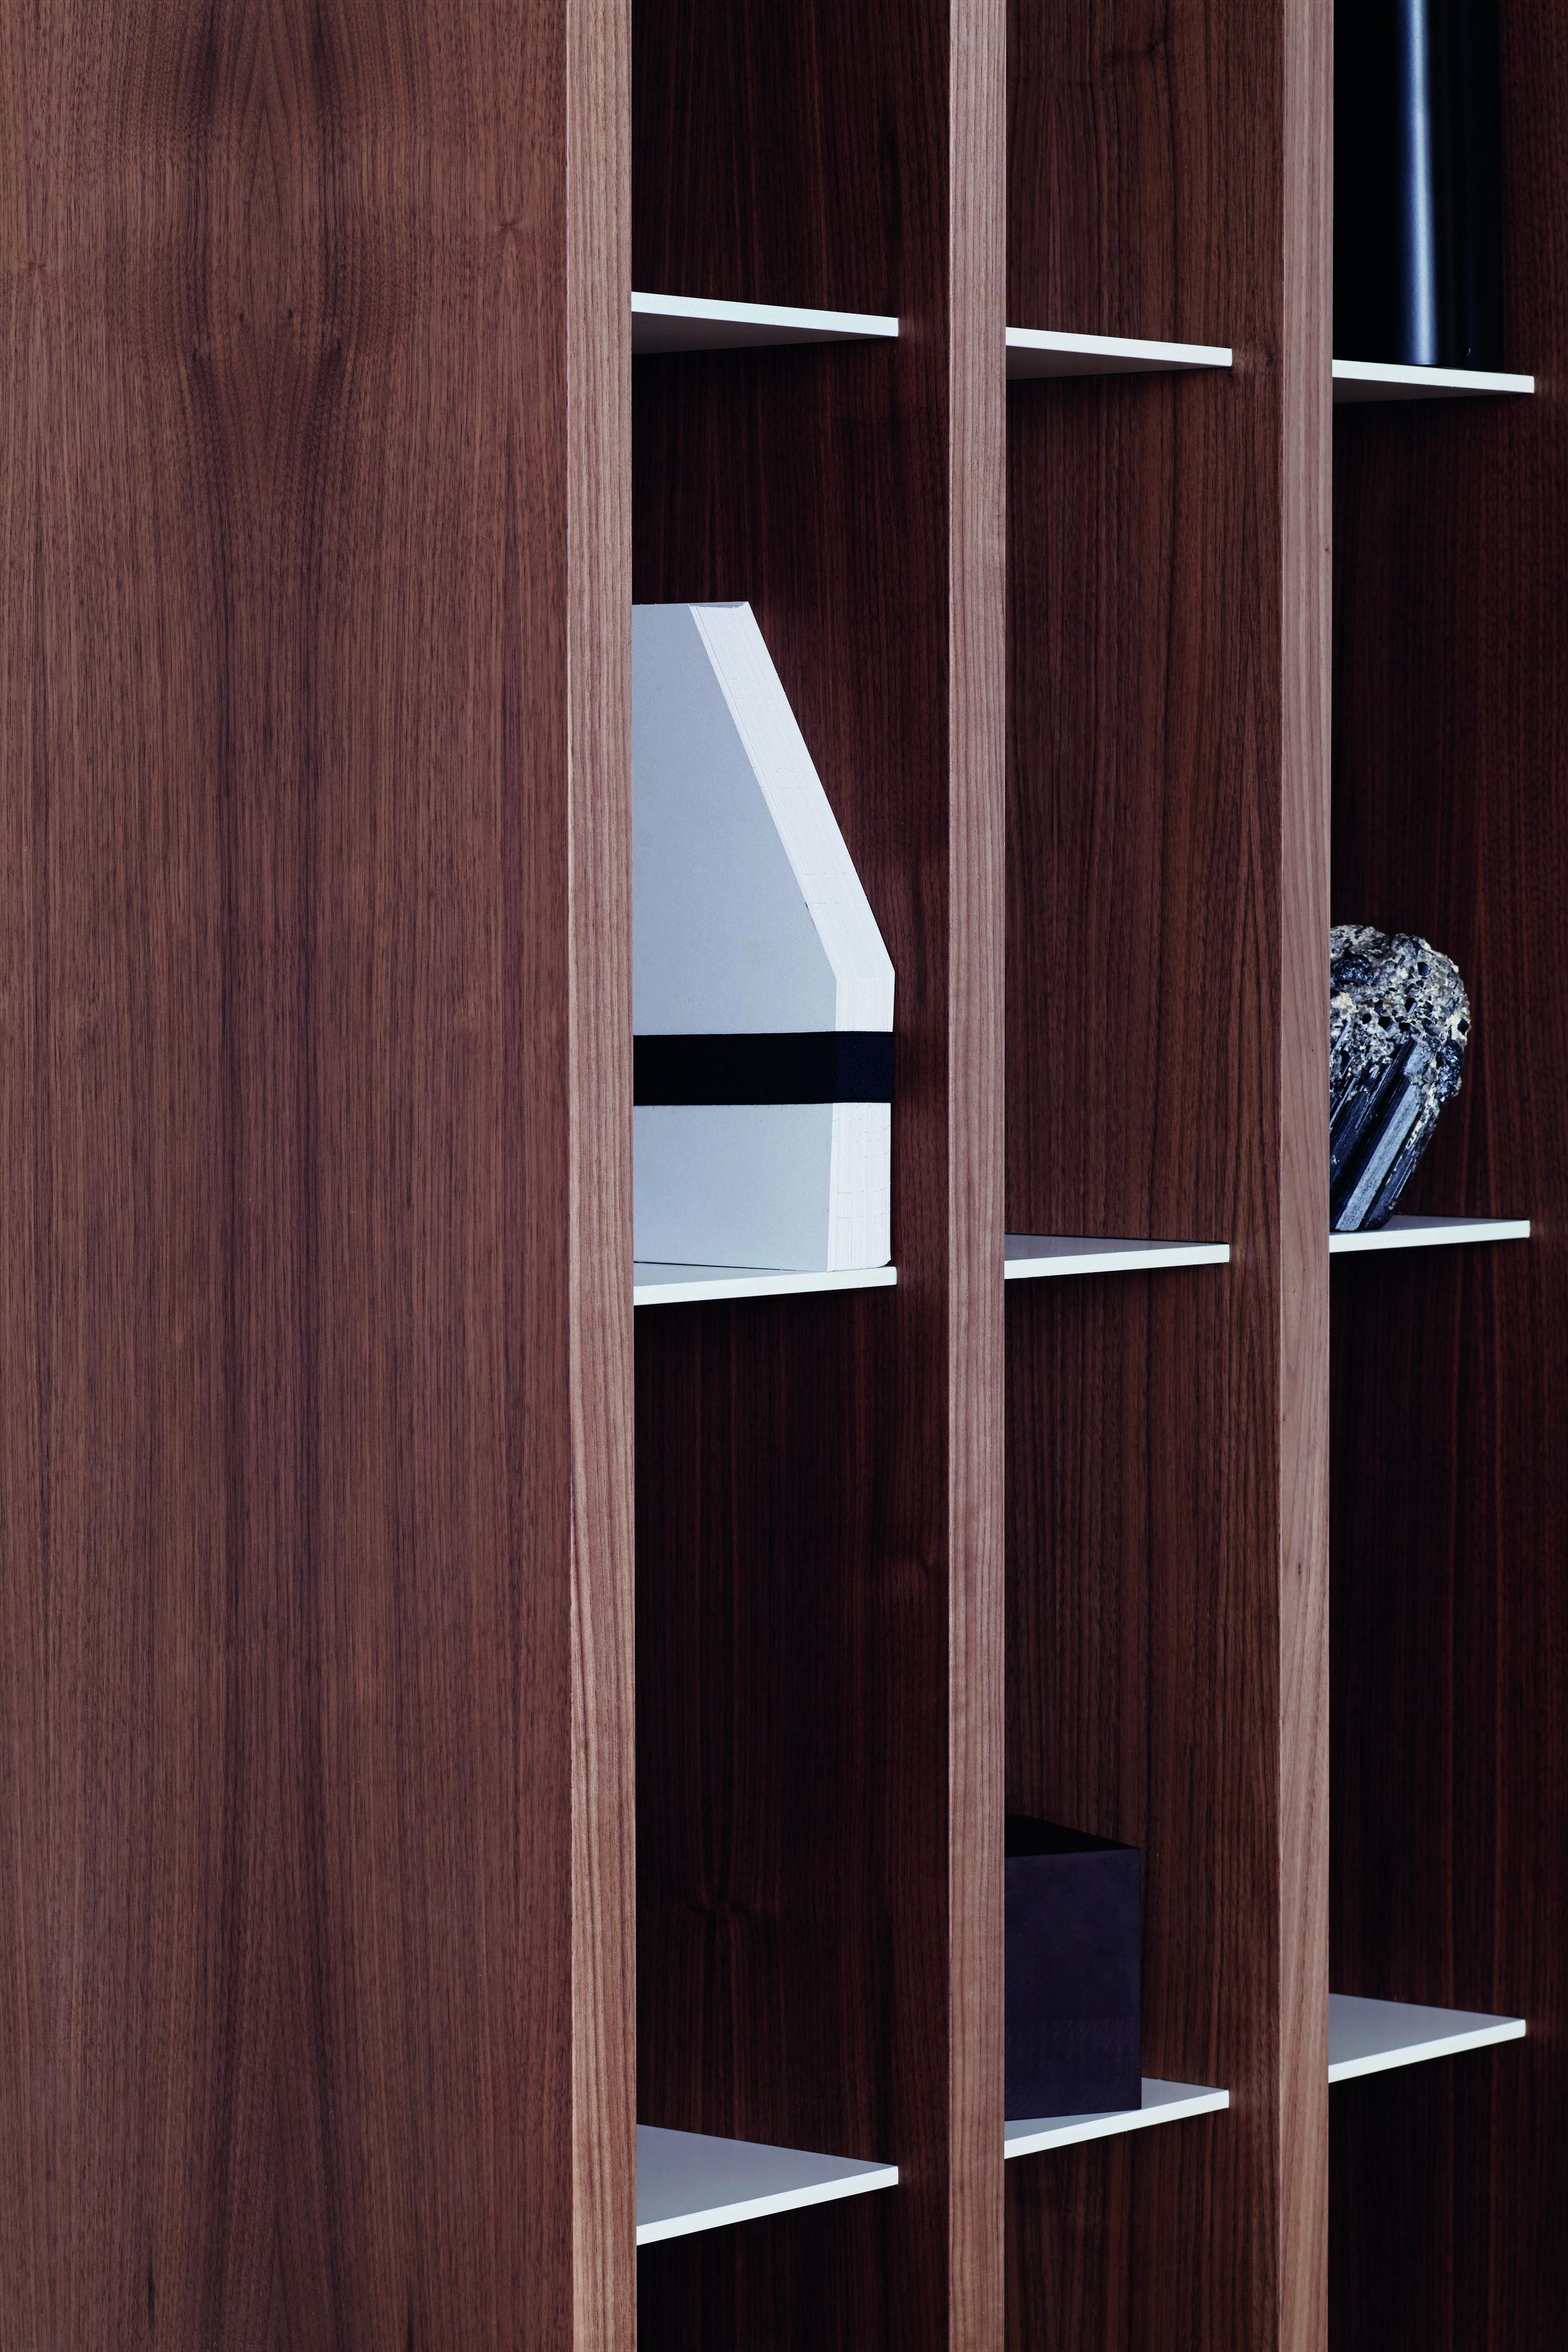 05_Parere_Bookcase.jpg